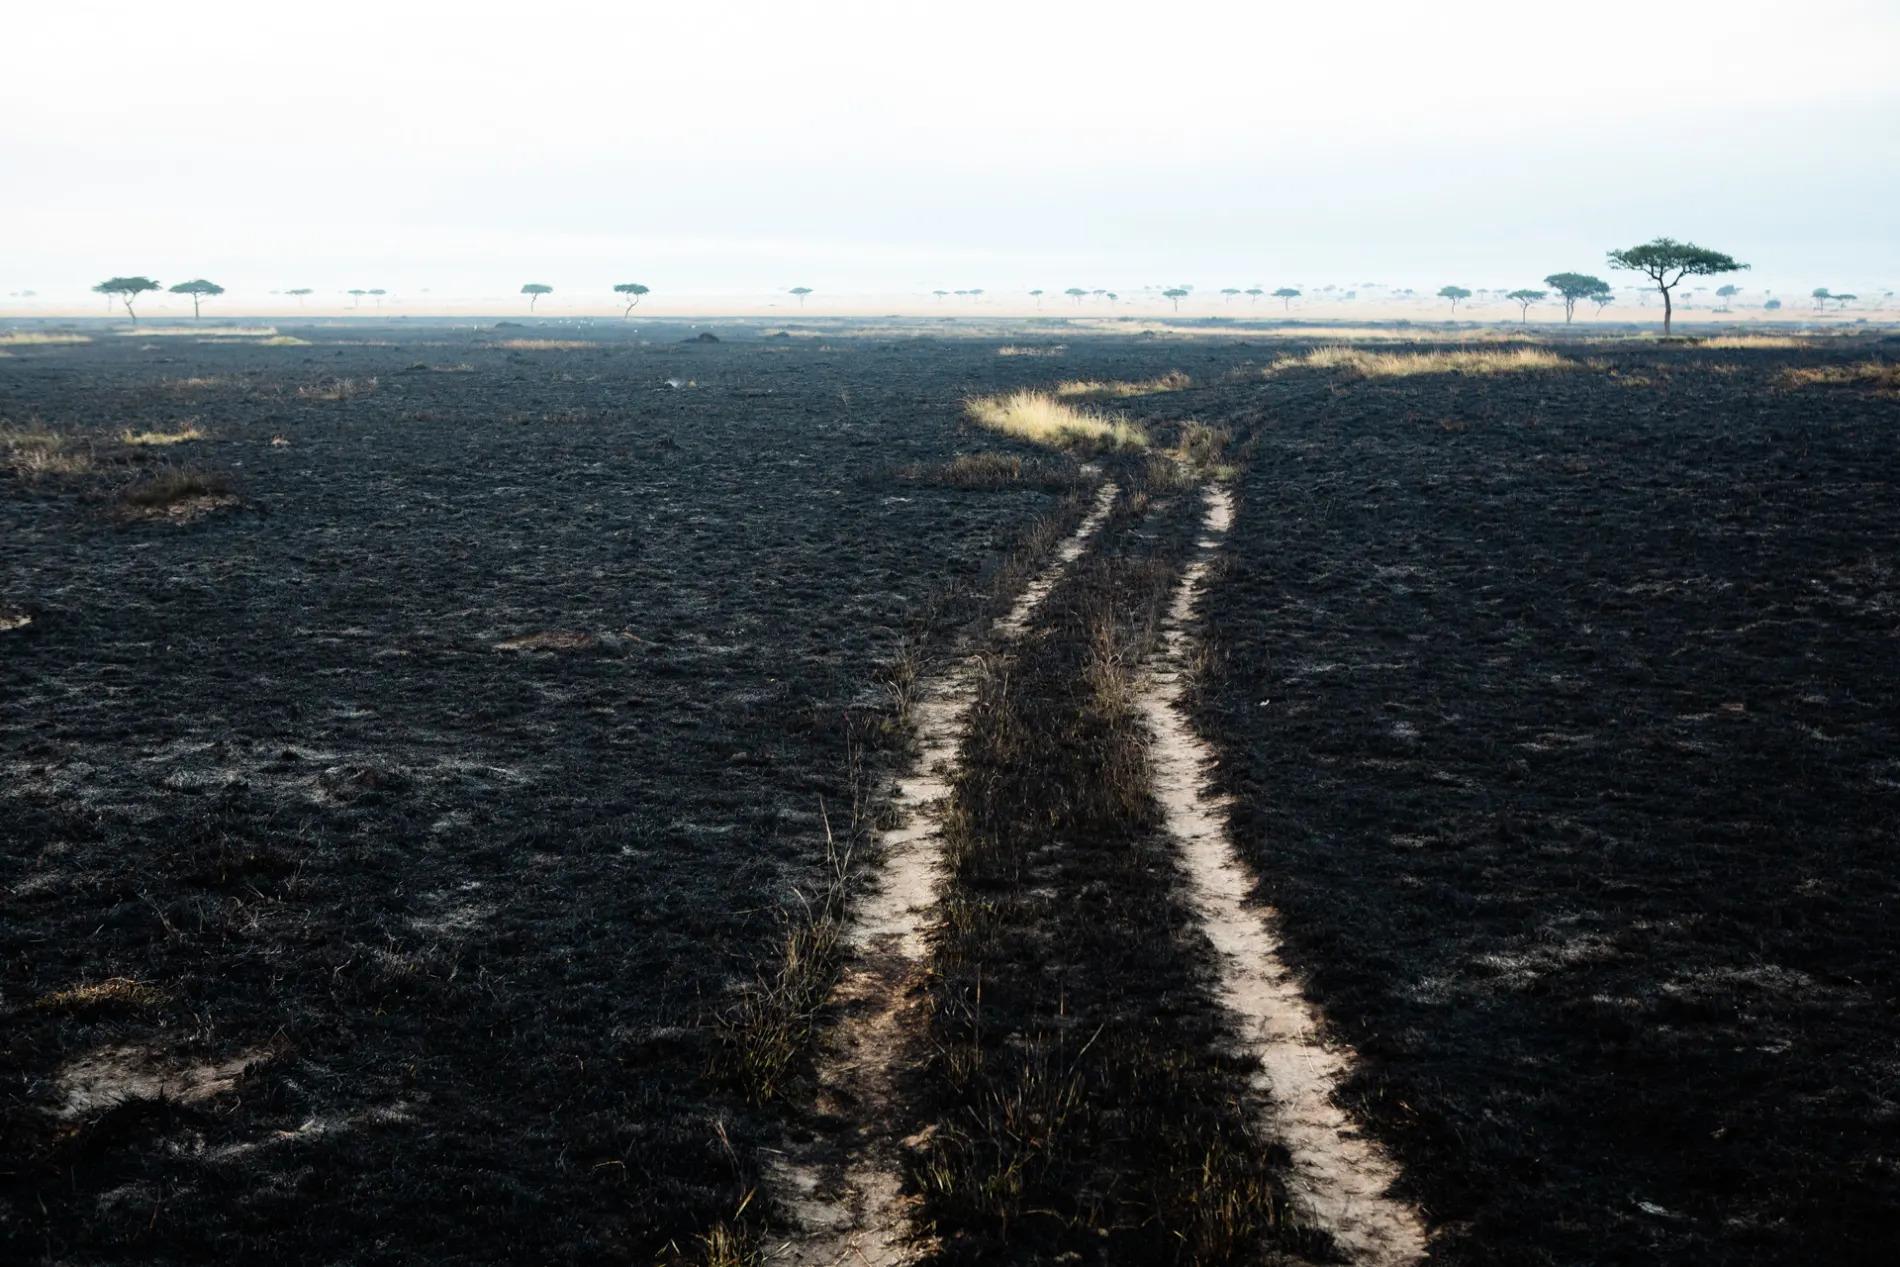 Road in burnt area